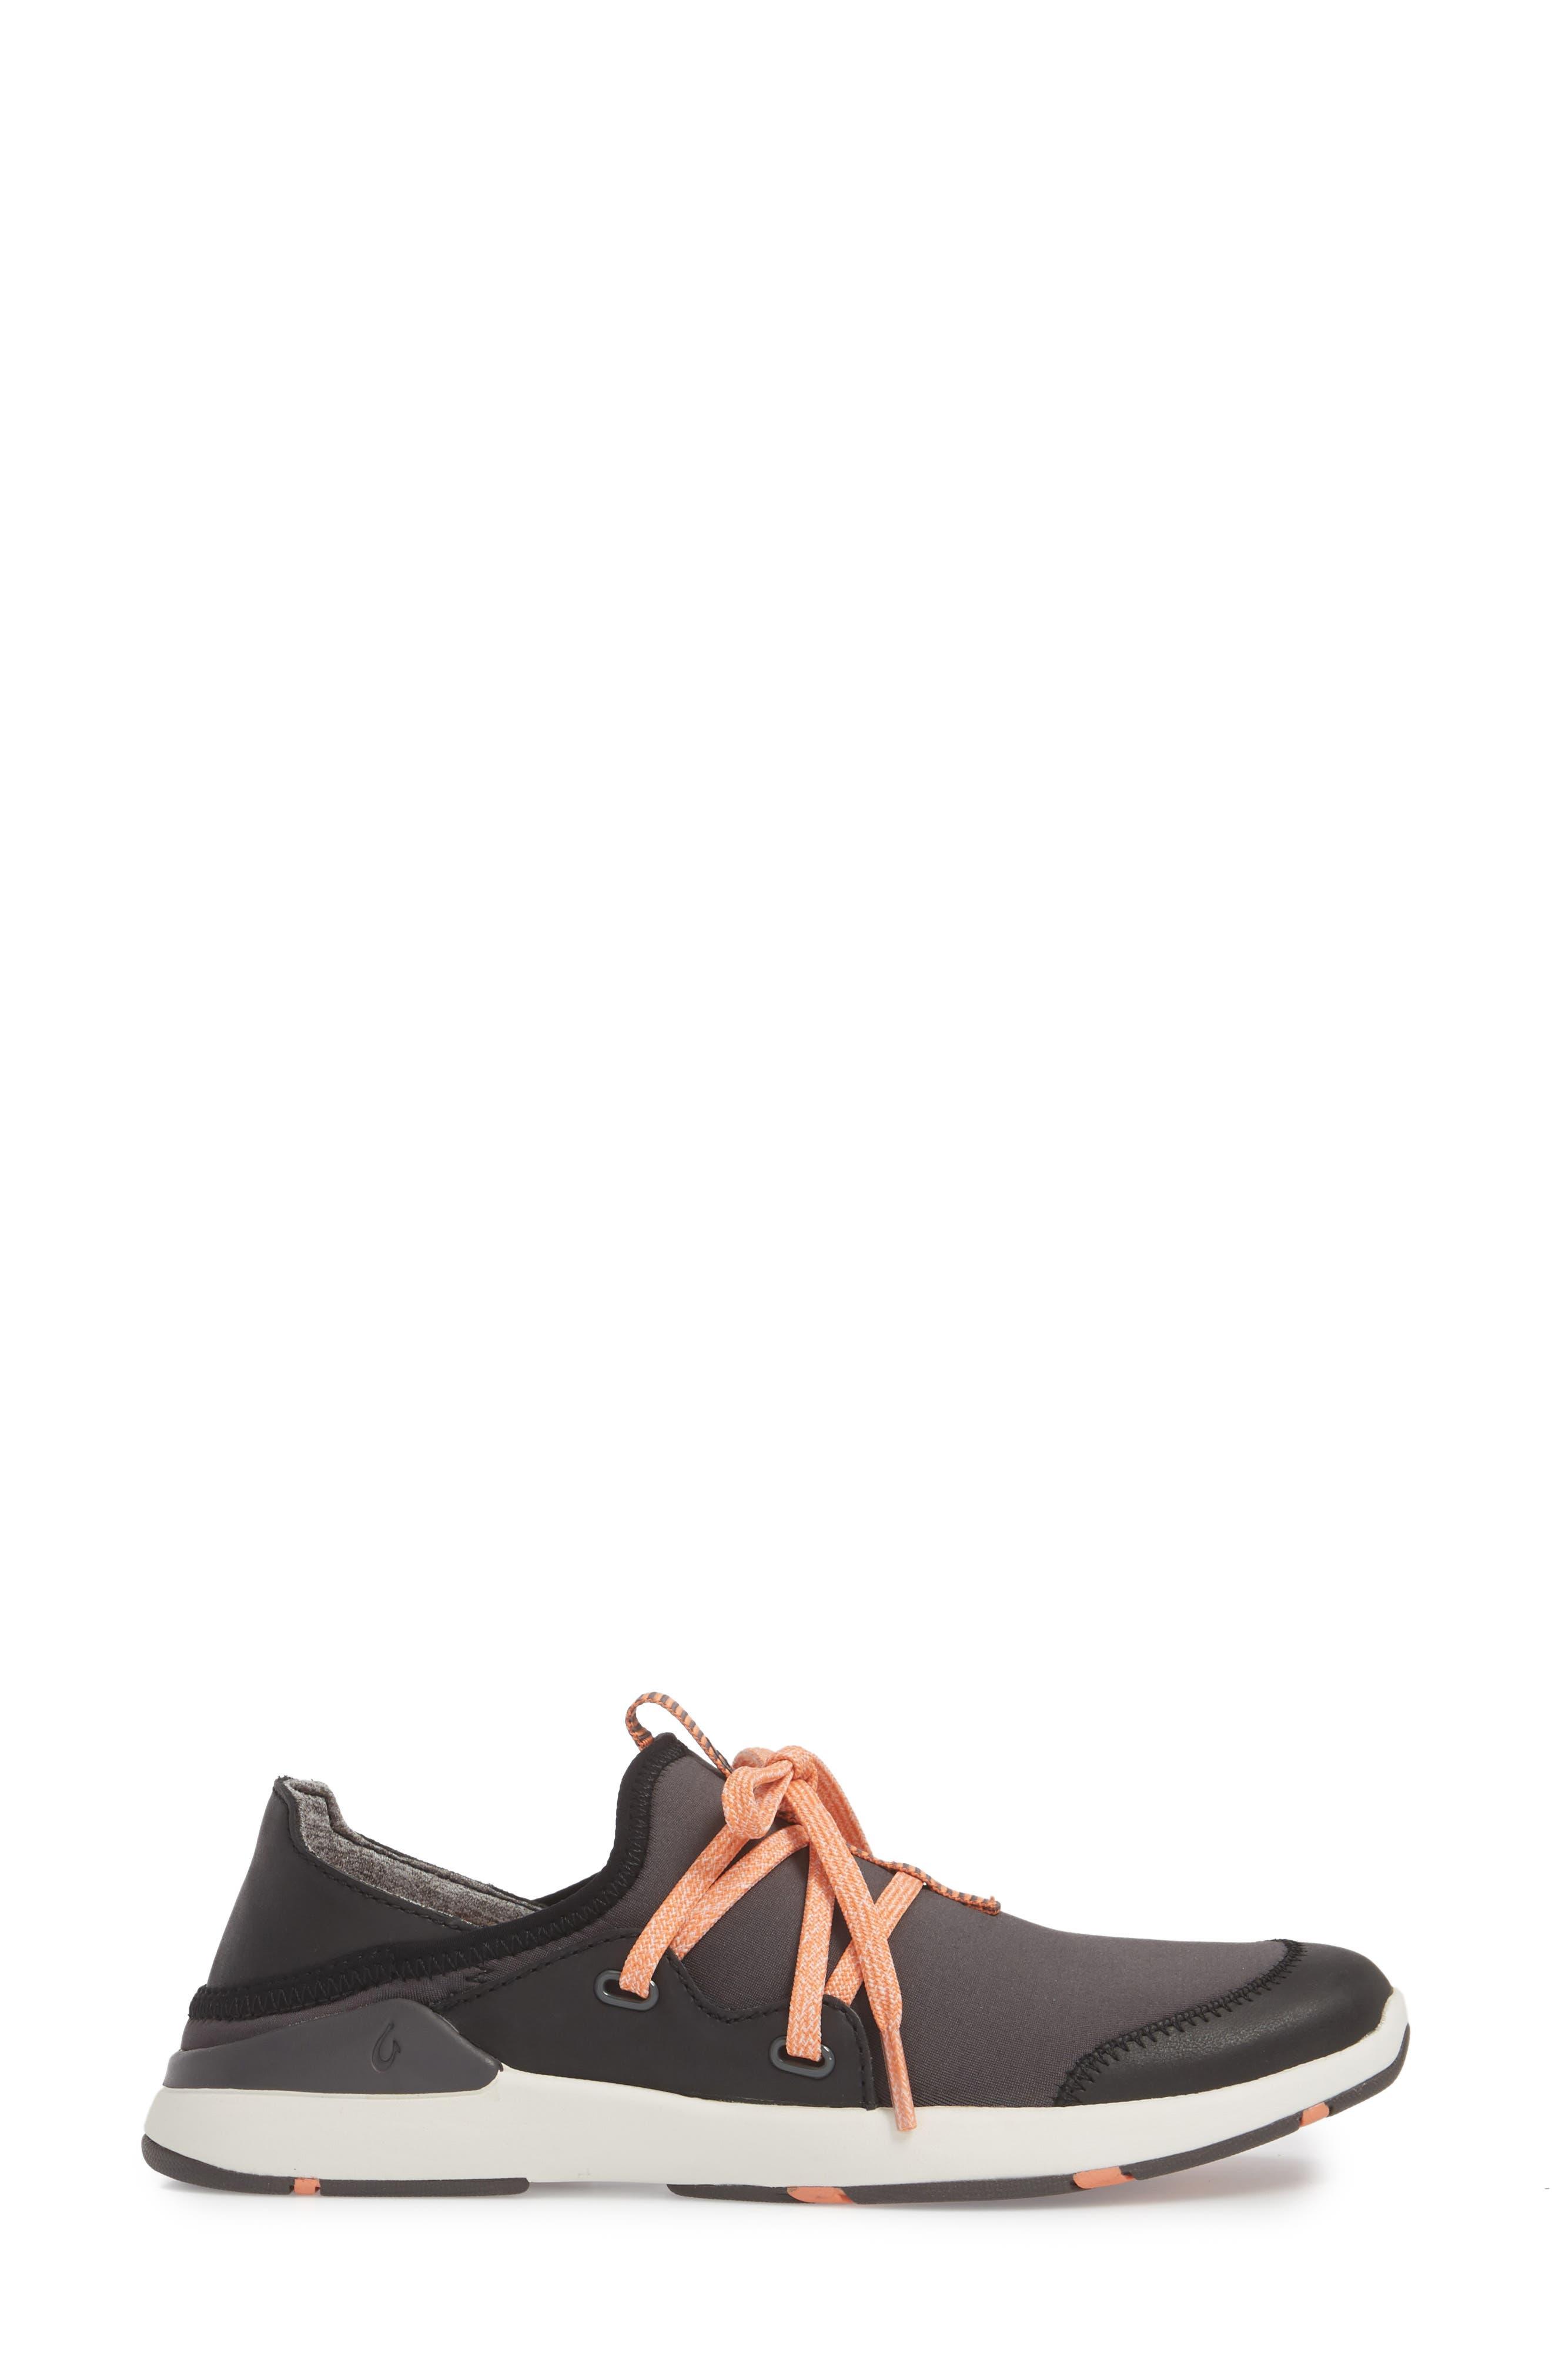 Miki Li Convertible Sneaker,                             Alternate thumbnail 3, color,                             PAVEMENT/ BLACK FABRIC